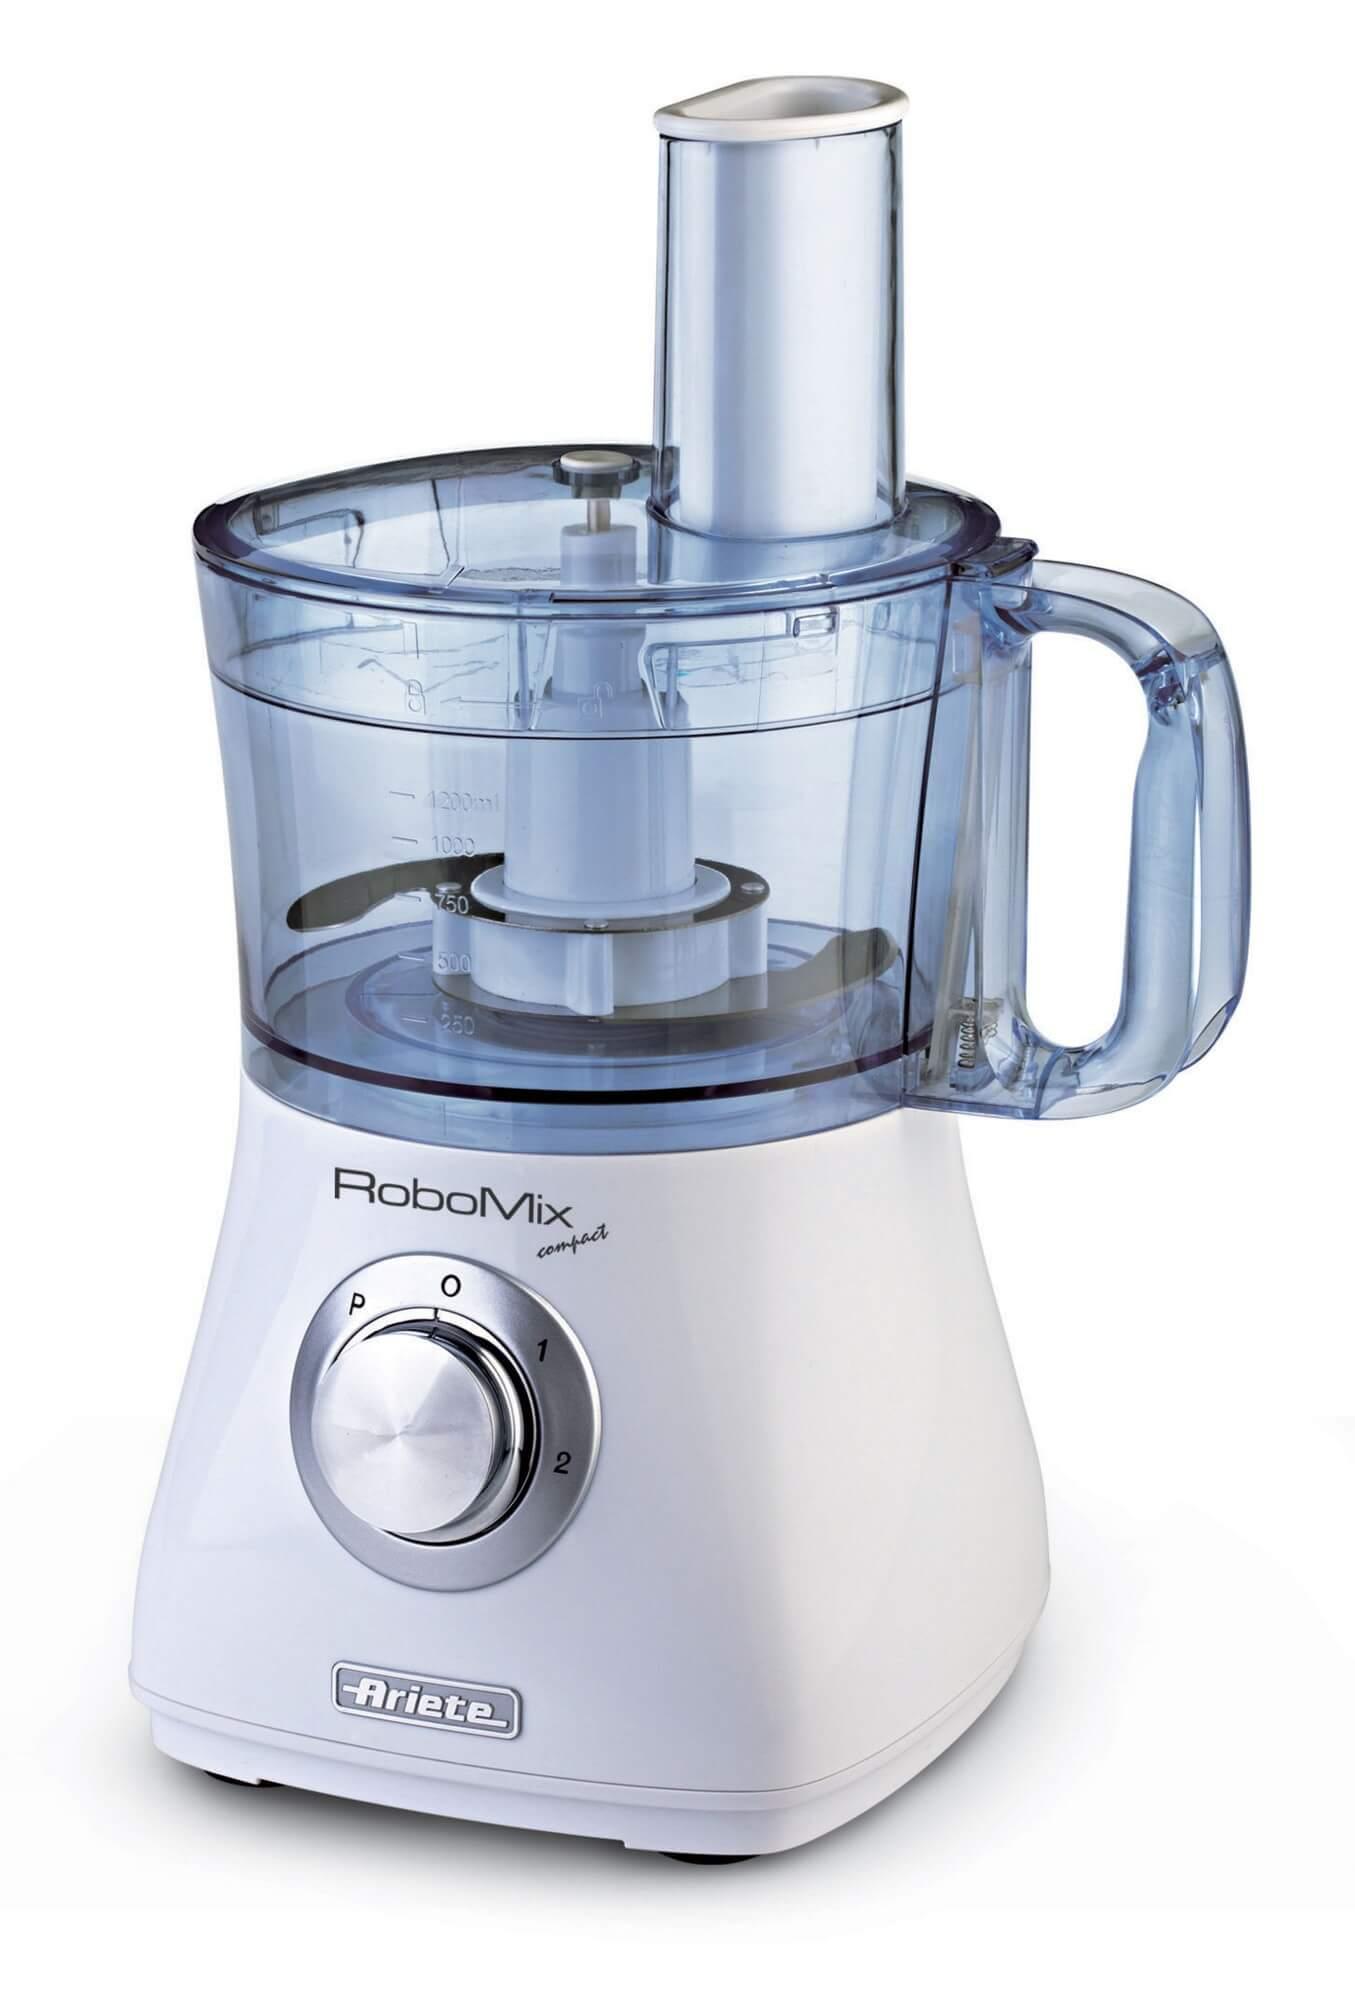 Robomix compact ariete store - Robot da cucina offerte ...